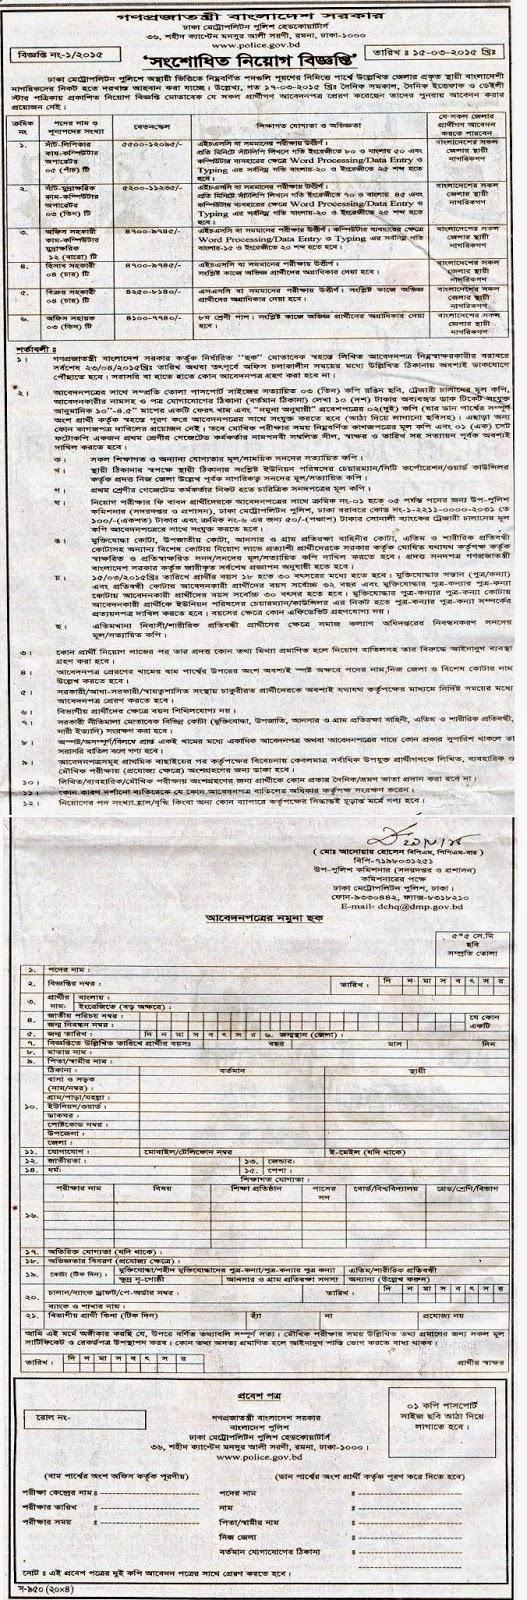 Organization: Dhaka Metropolitan Police Head quarters, Position: Steno Graphar cum Computer Operator, Steno Typist cum Computer Operator and mane more